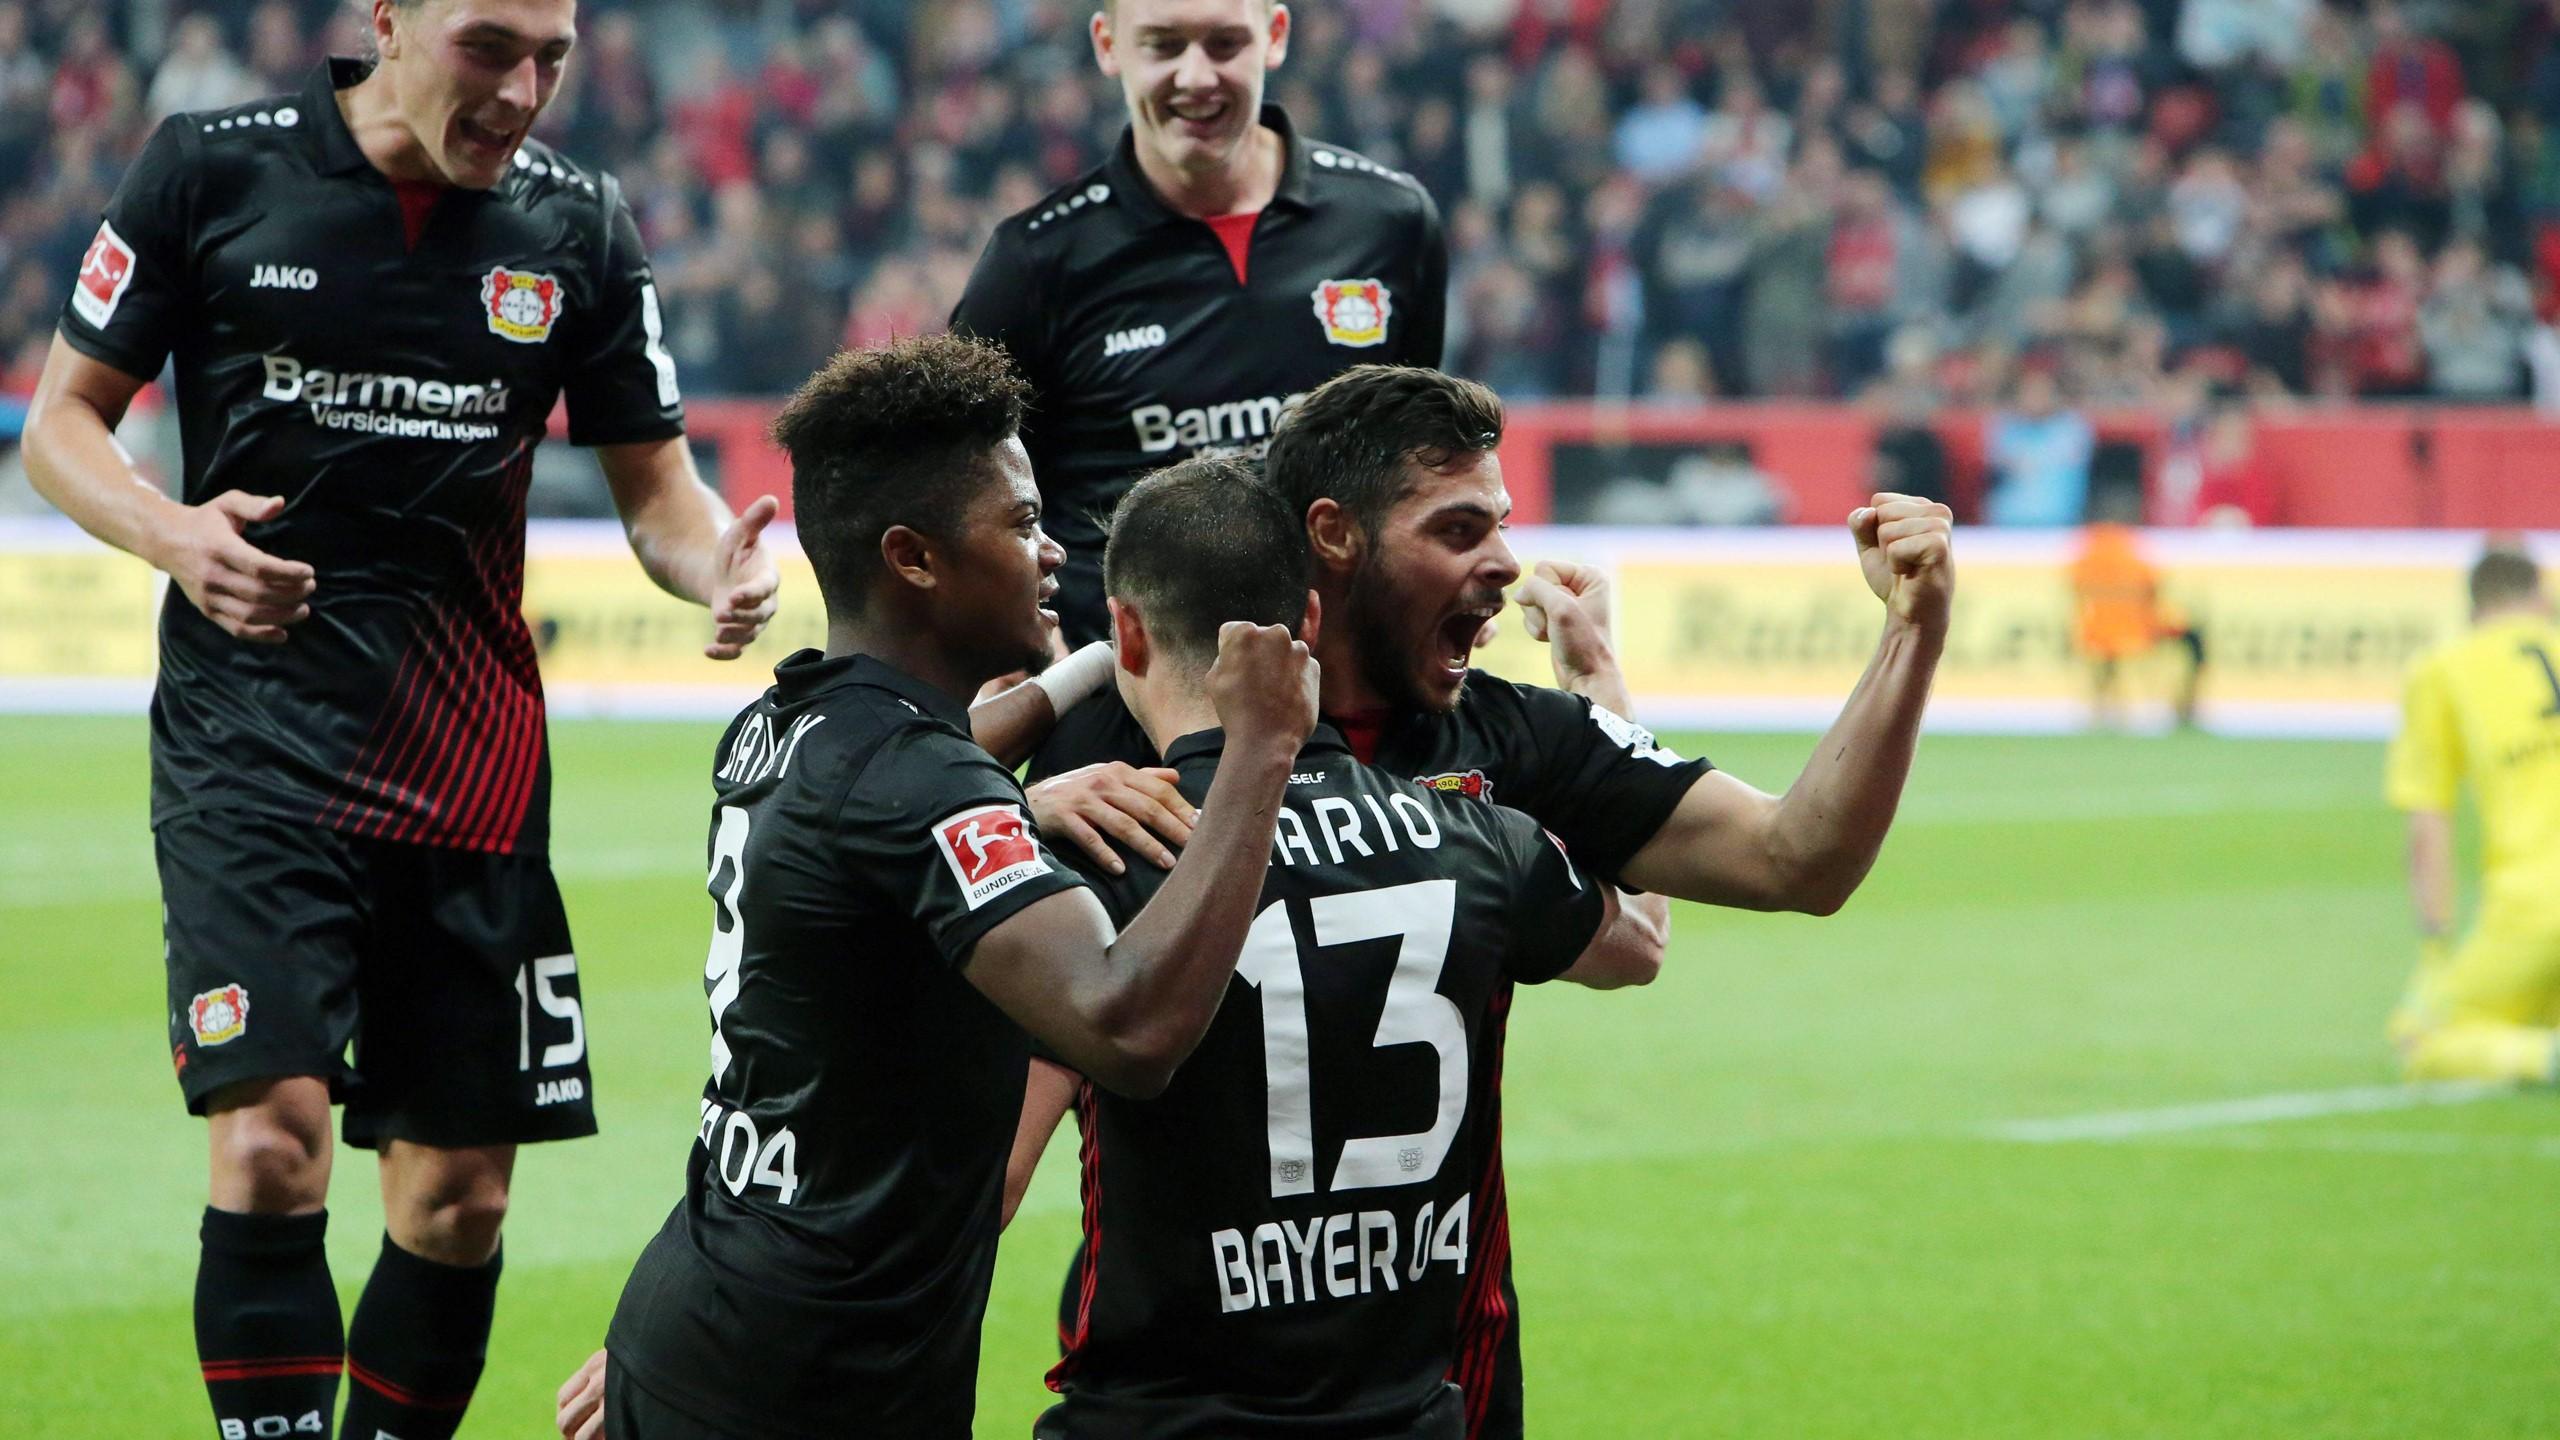 Bayer 04 Leverkusen Gegen Hamburger Sv